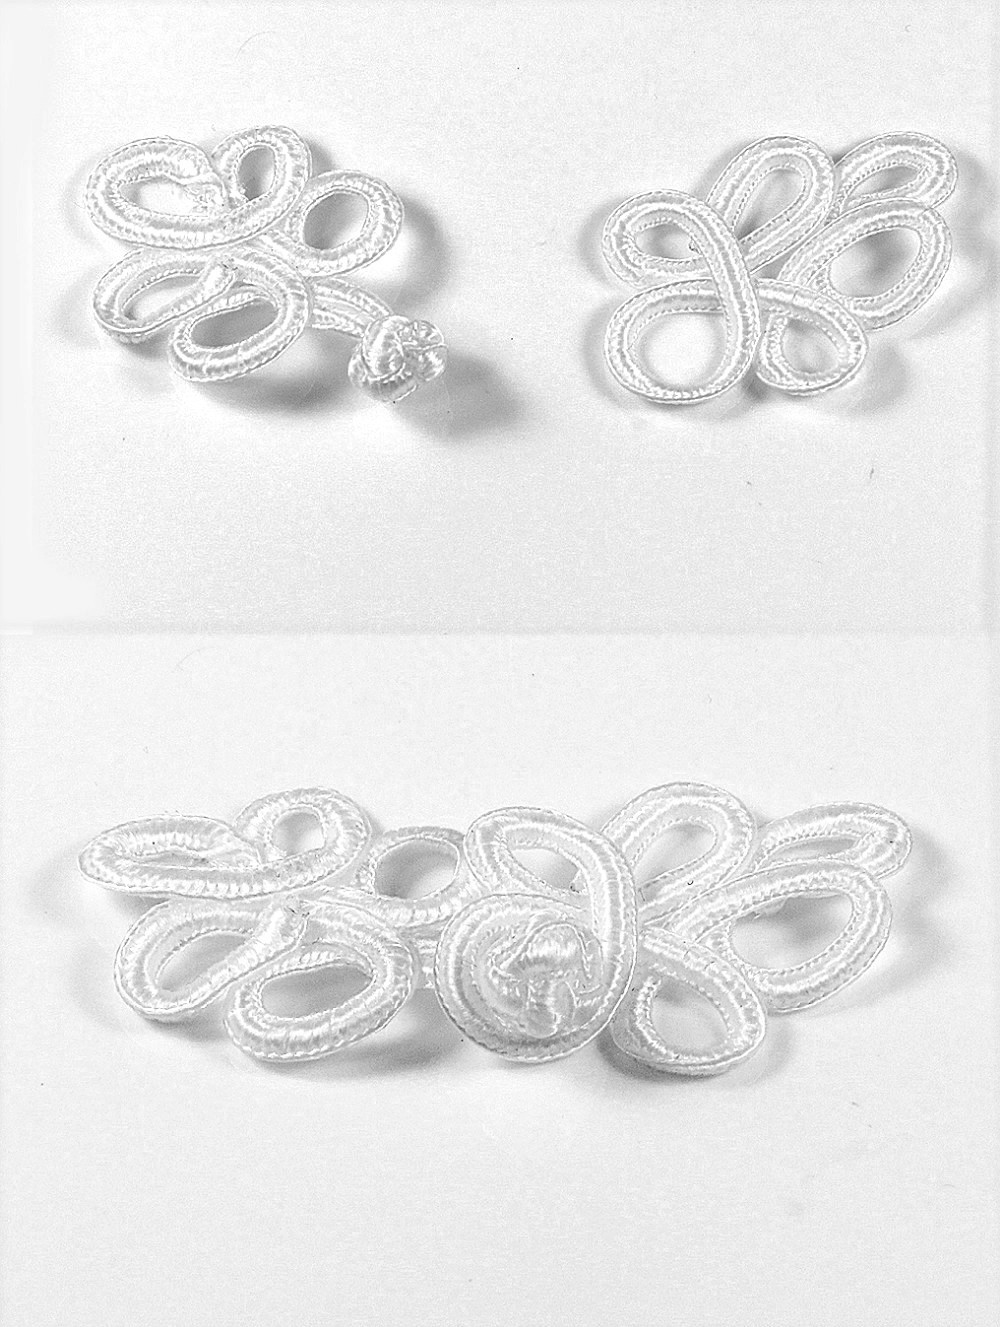 ᑎ‰20 Unidades artesanal Telas blanco trenzado hueco hoja botón ...